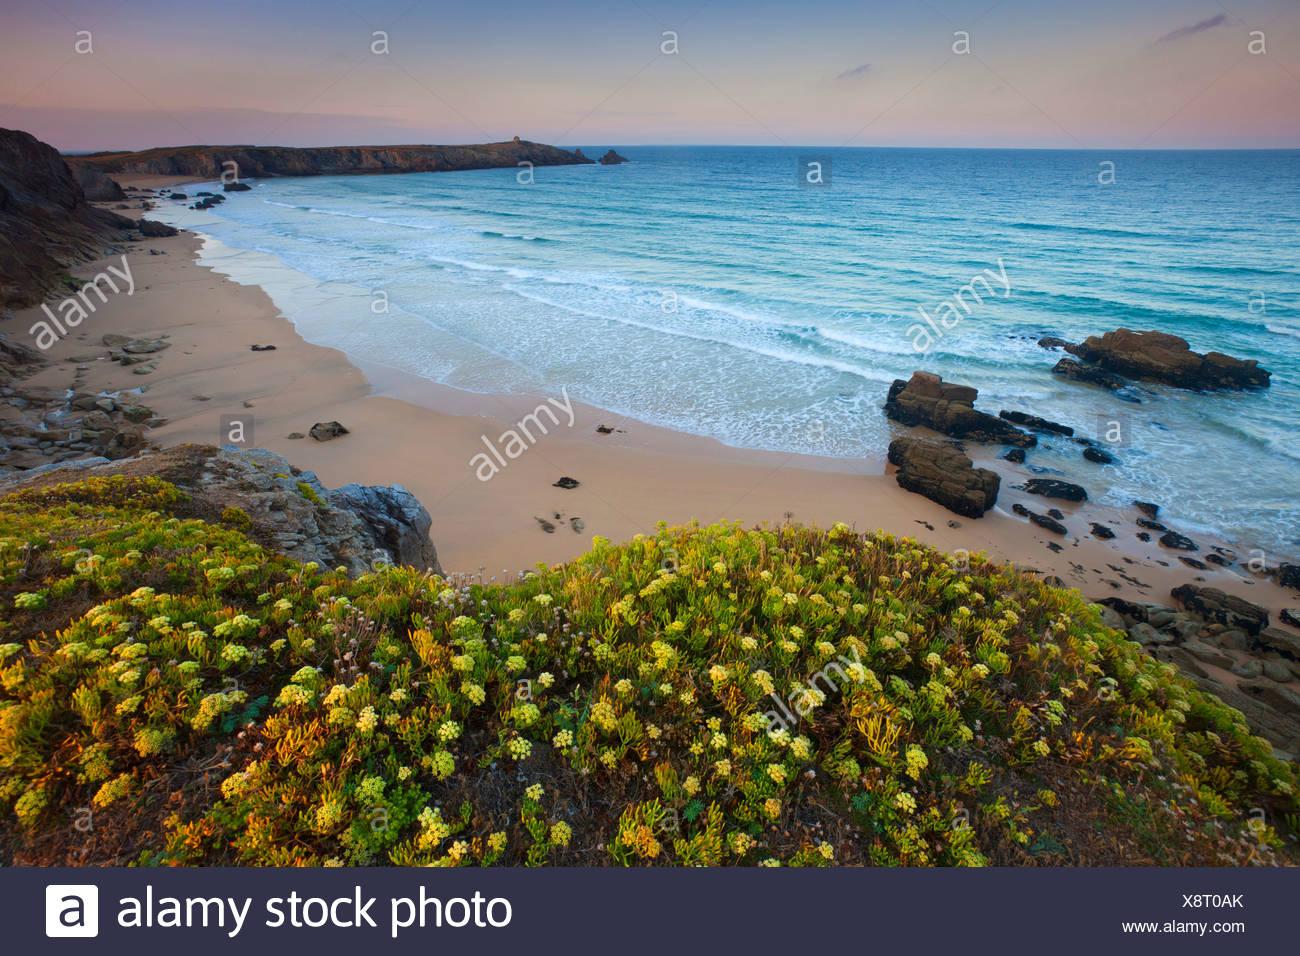 Côte Sauvage, France, Europe, Brittany, department Morbihan, coast, rock, cliff, sea, sand beach, coastal vegetation - Stock Image